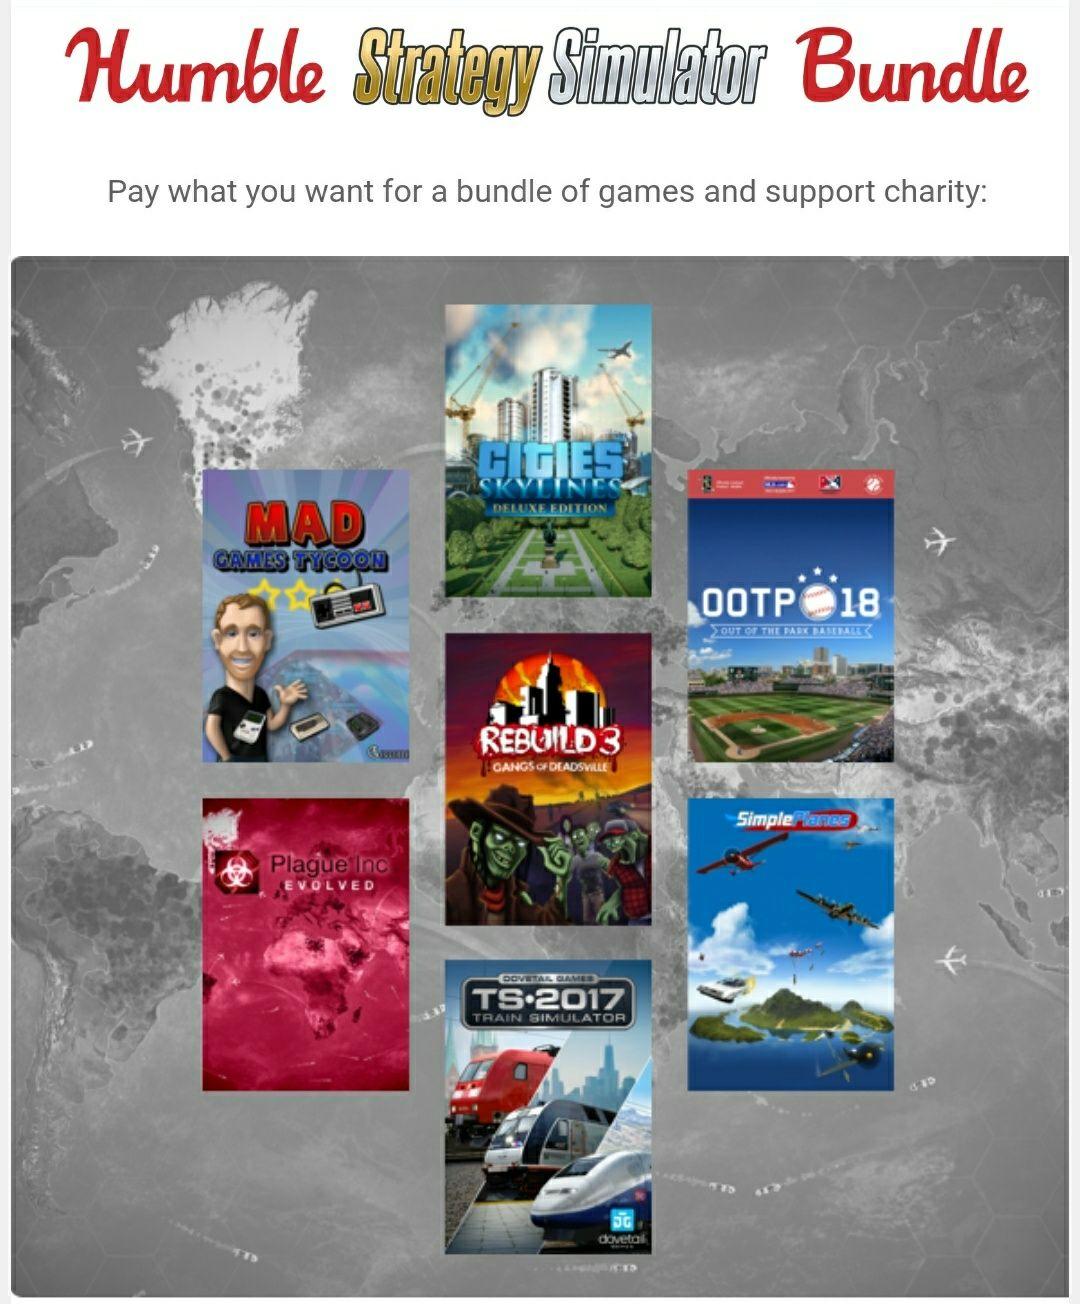 Humble Bundle Strategy Simulator Bundle